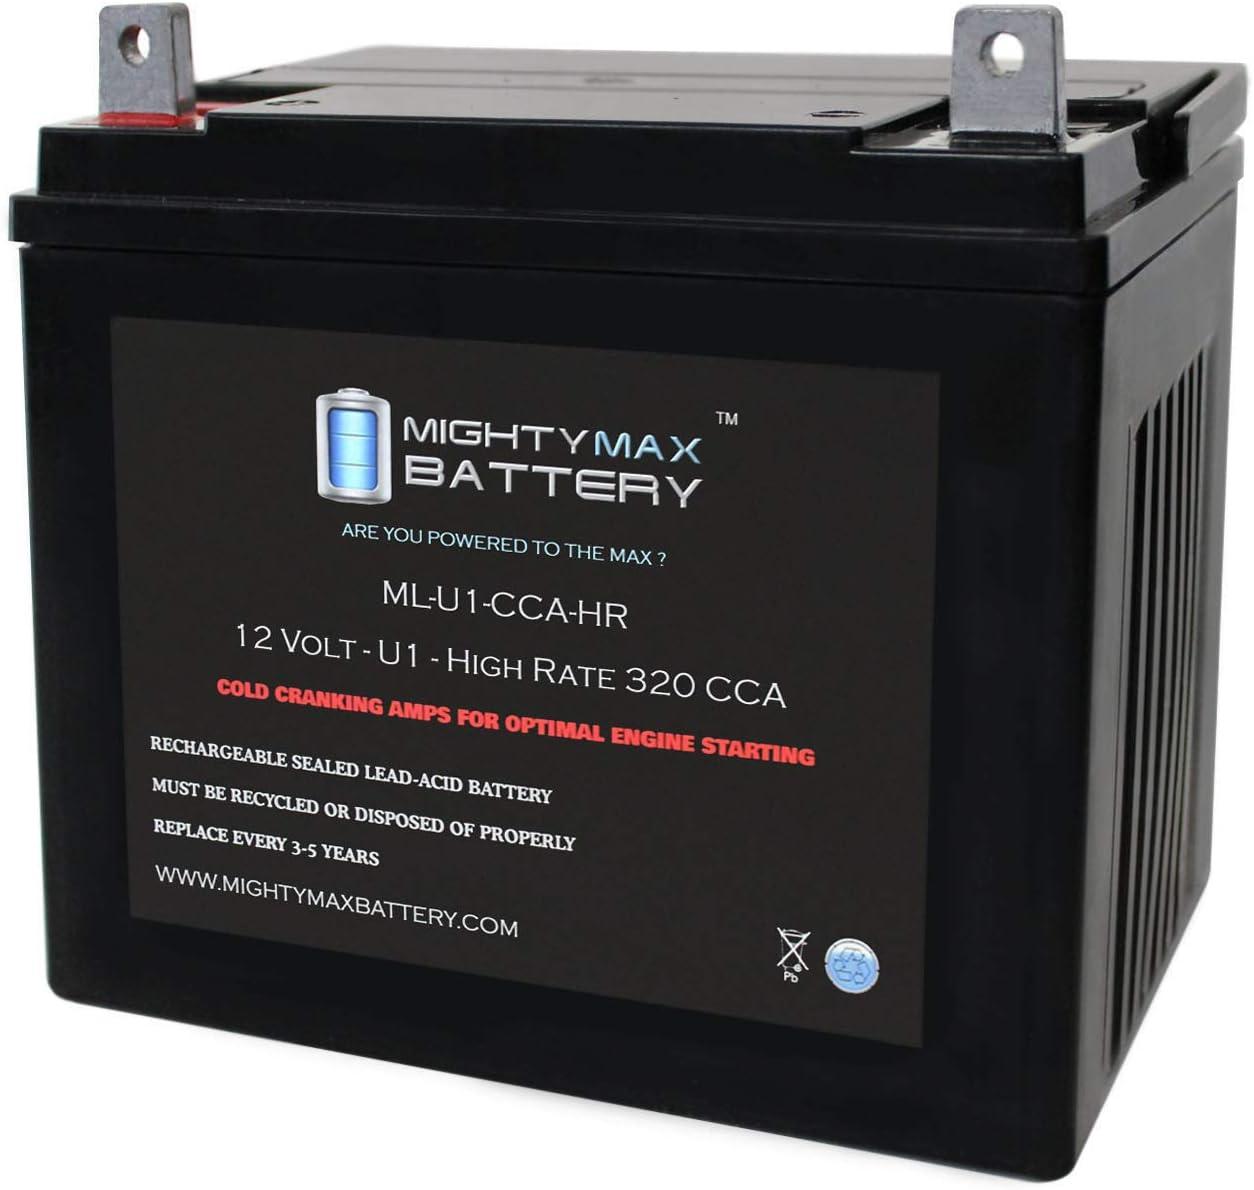 Mighty Max Battery ML-U1-CCAHR 12V 320CCA Battery